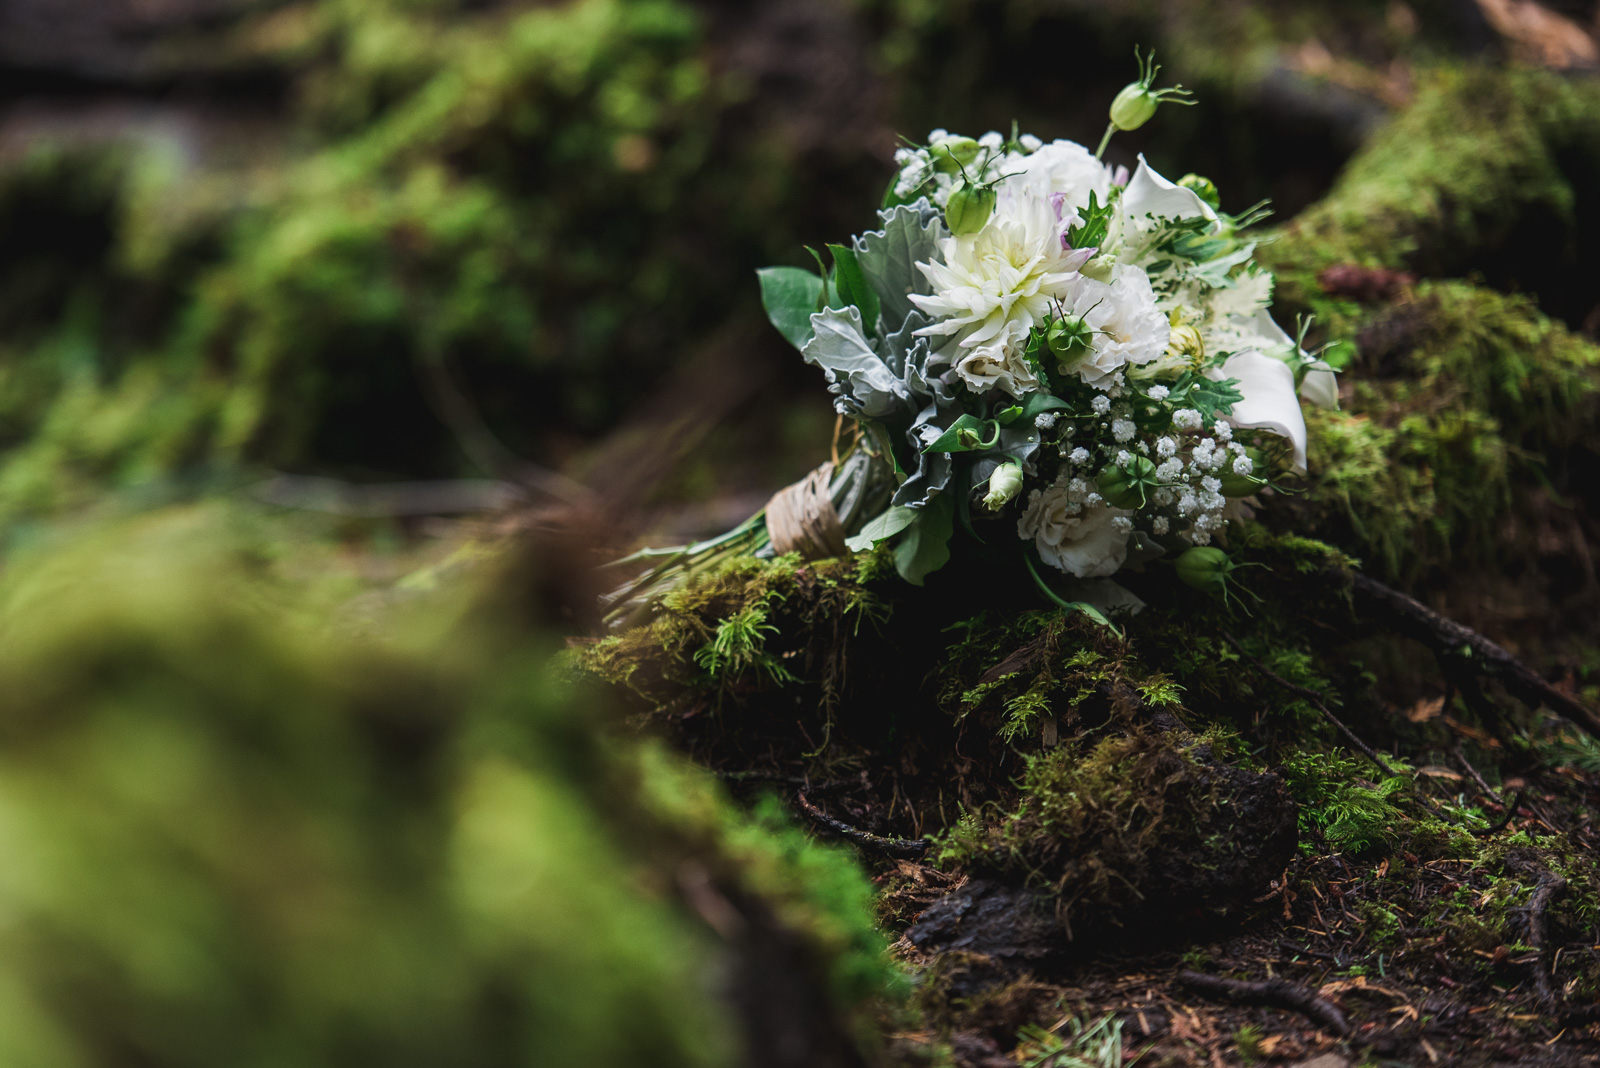 vancouver-island-wedding-photographers-cliff-gilker-park-smugglers-cove-elopement-16.jpg